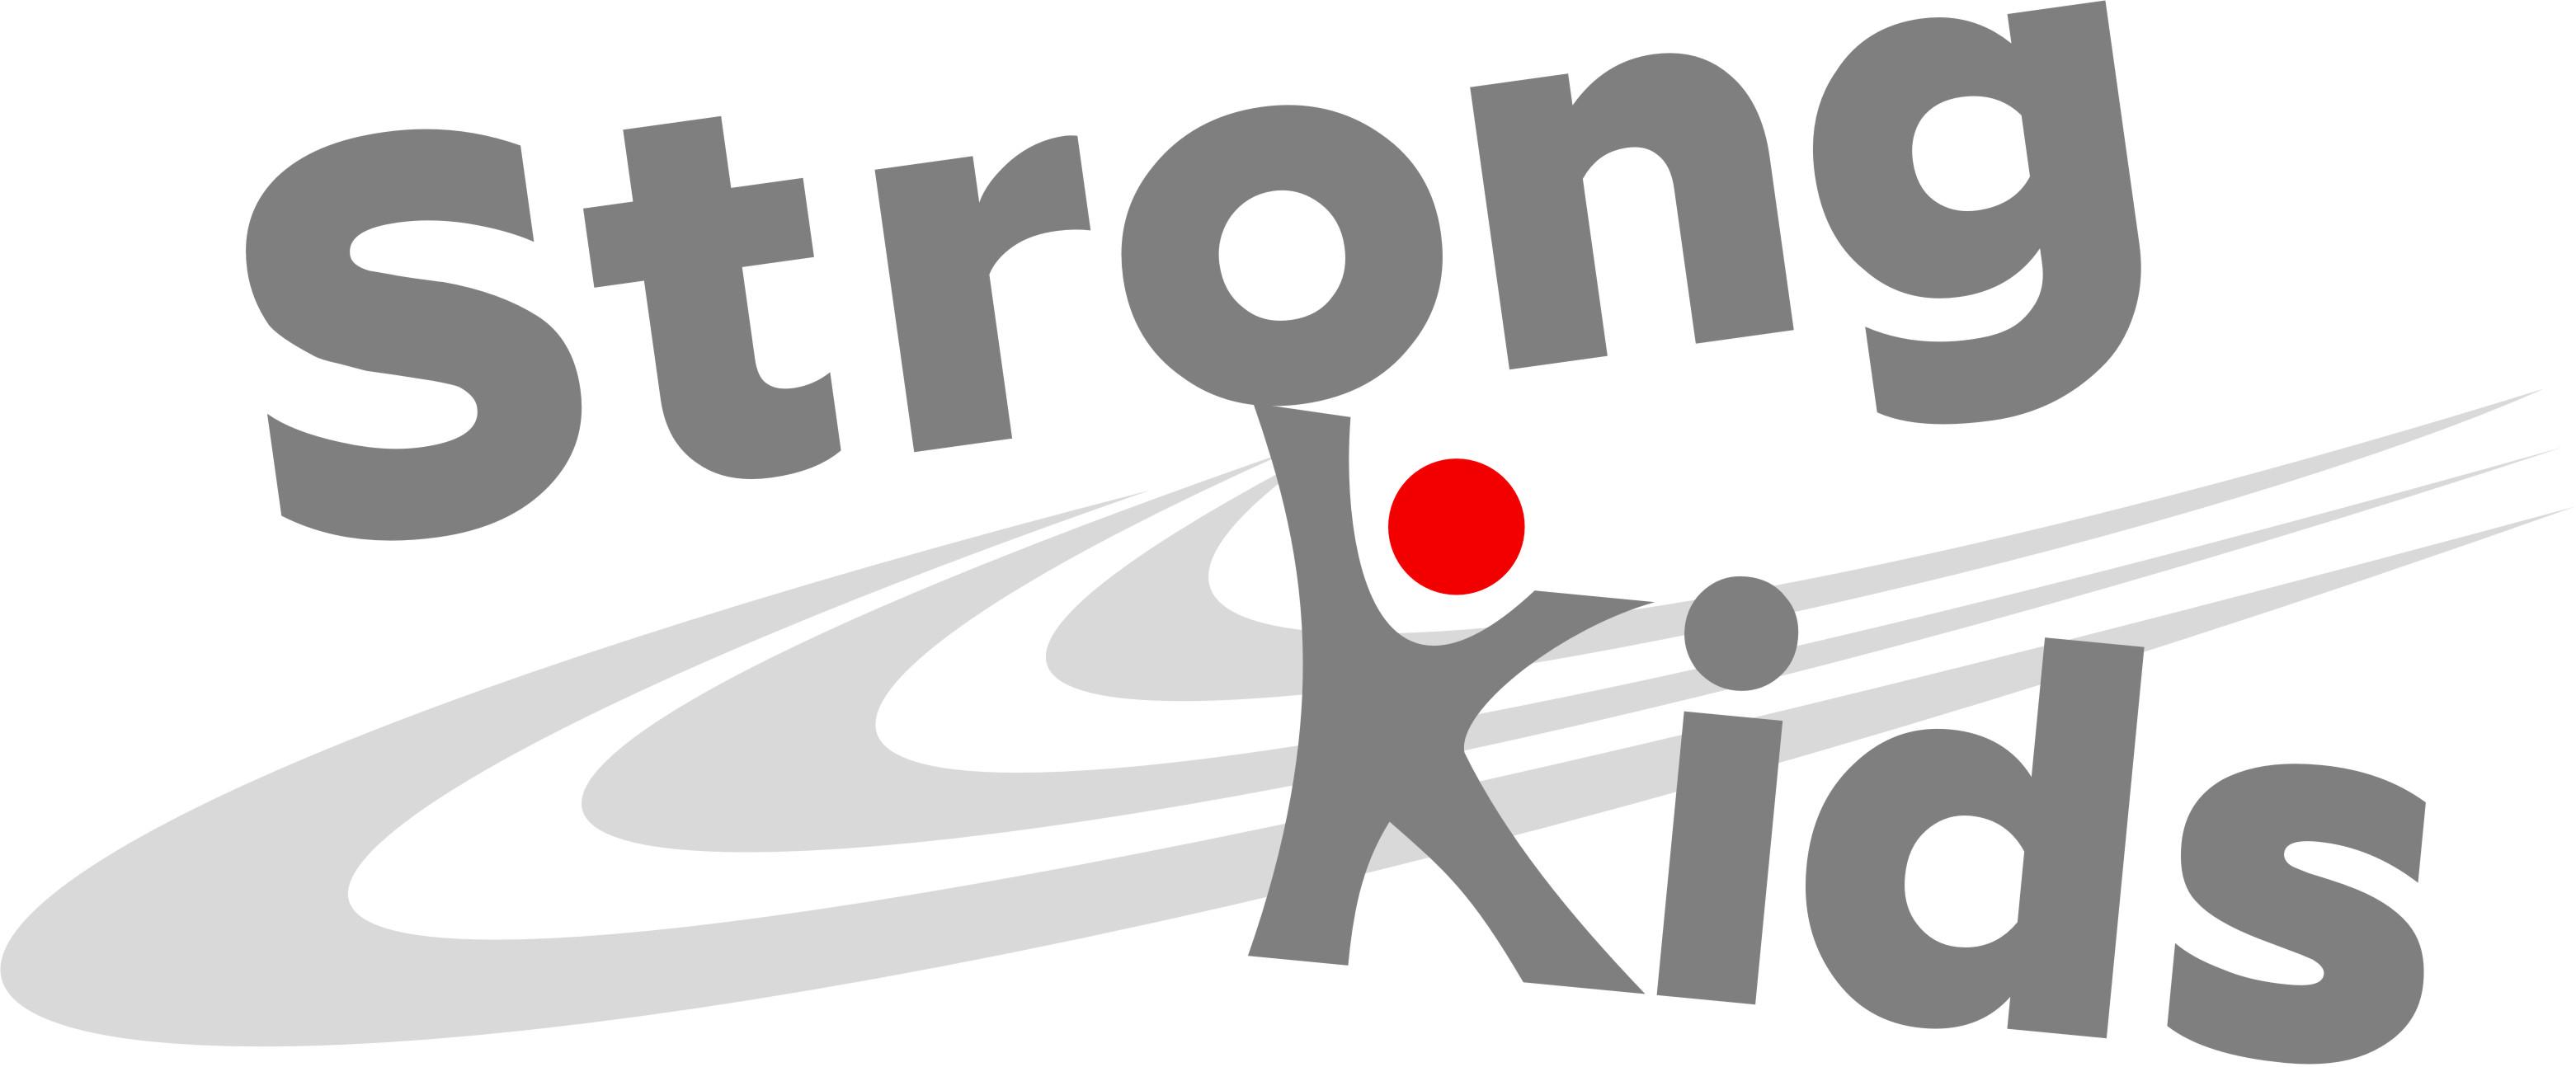 Логотип для Детского Интернет Магазина StrongKids фото f_4585c88e3f7b1d6e.jpg